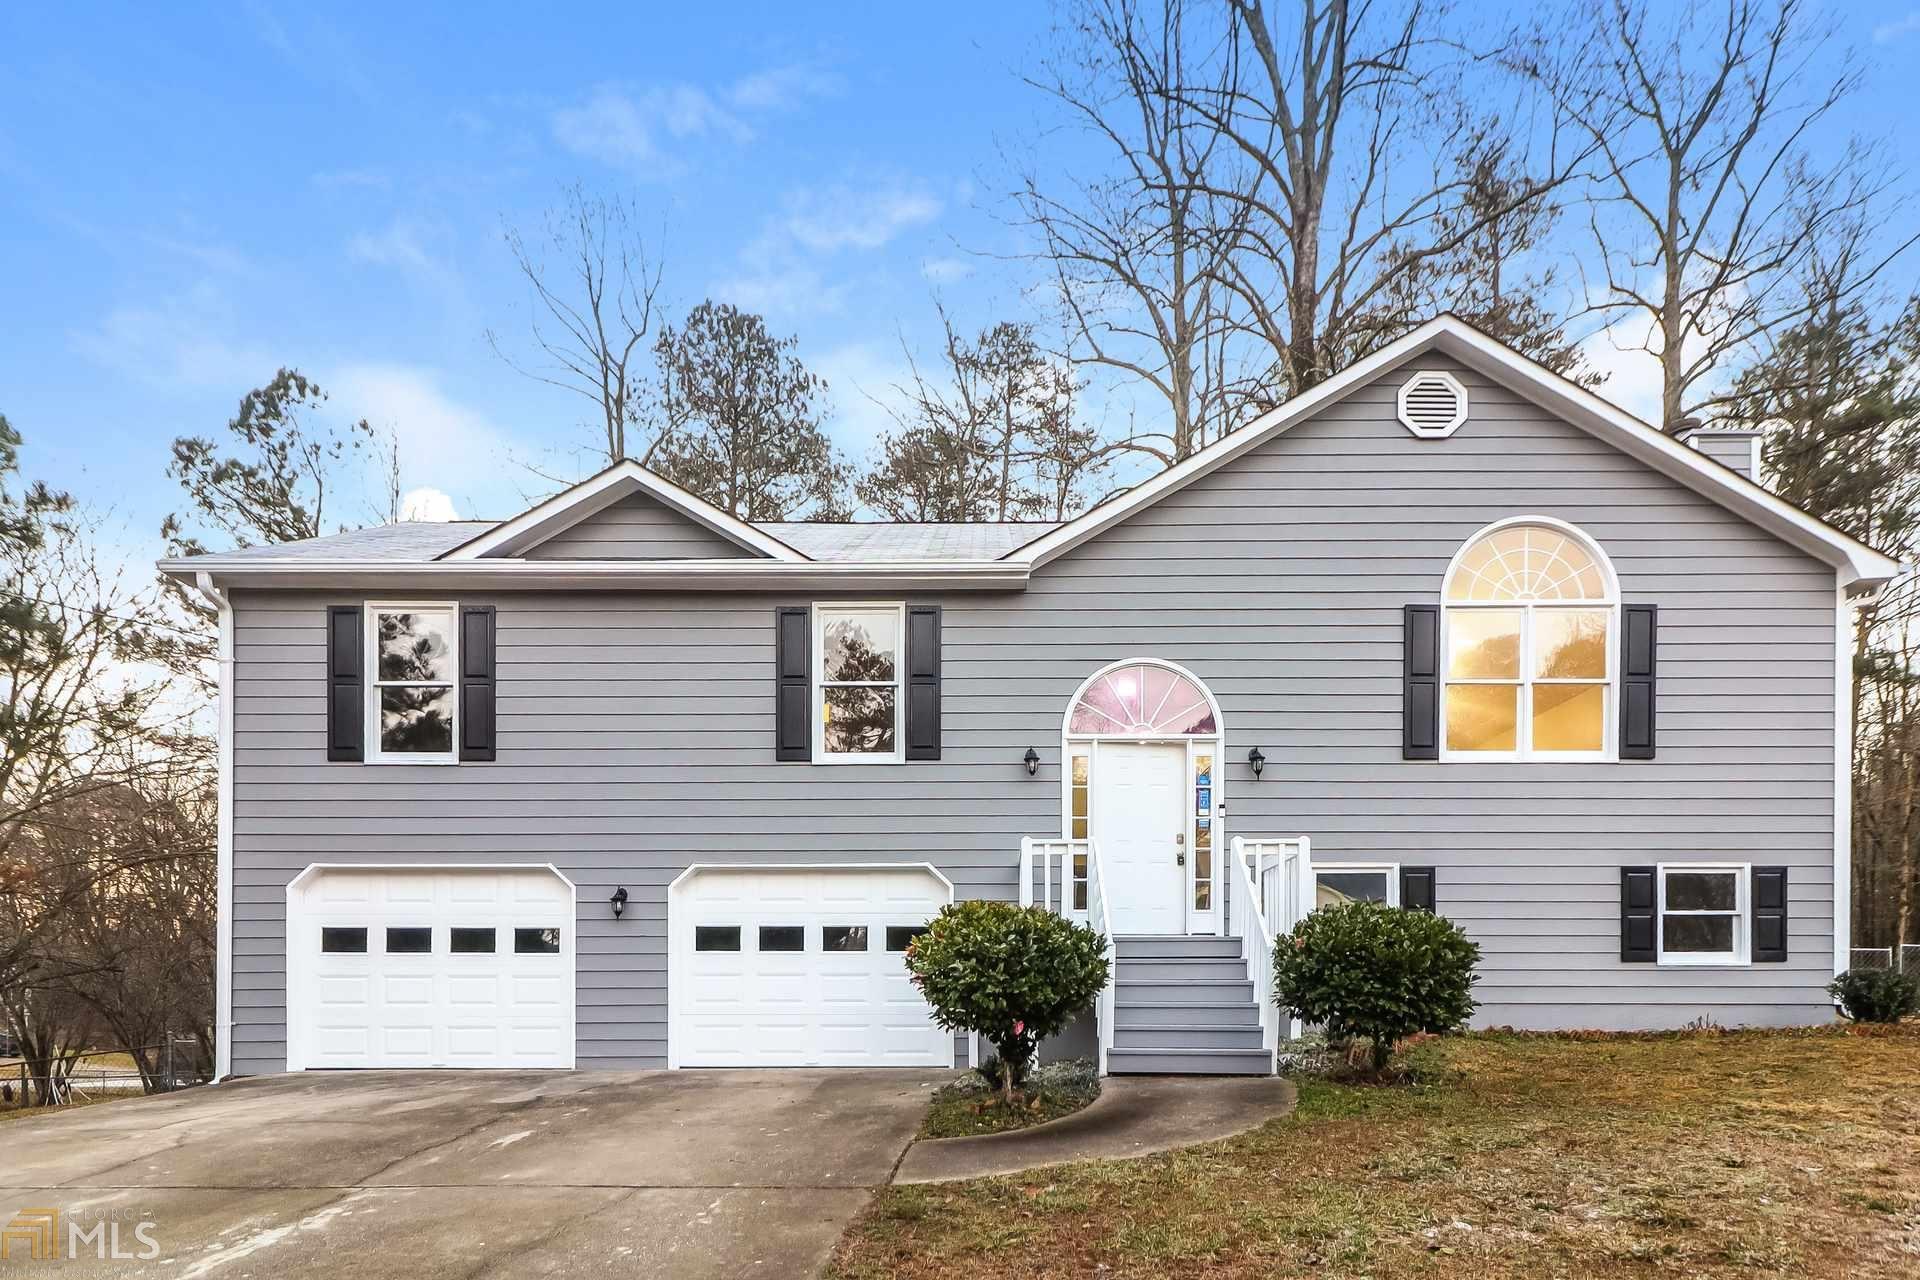 2329 La Maison, Lawrenceville, GA 30043 - #: 8911917